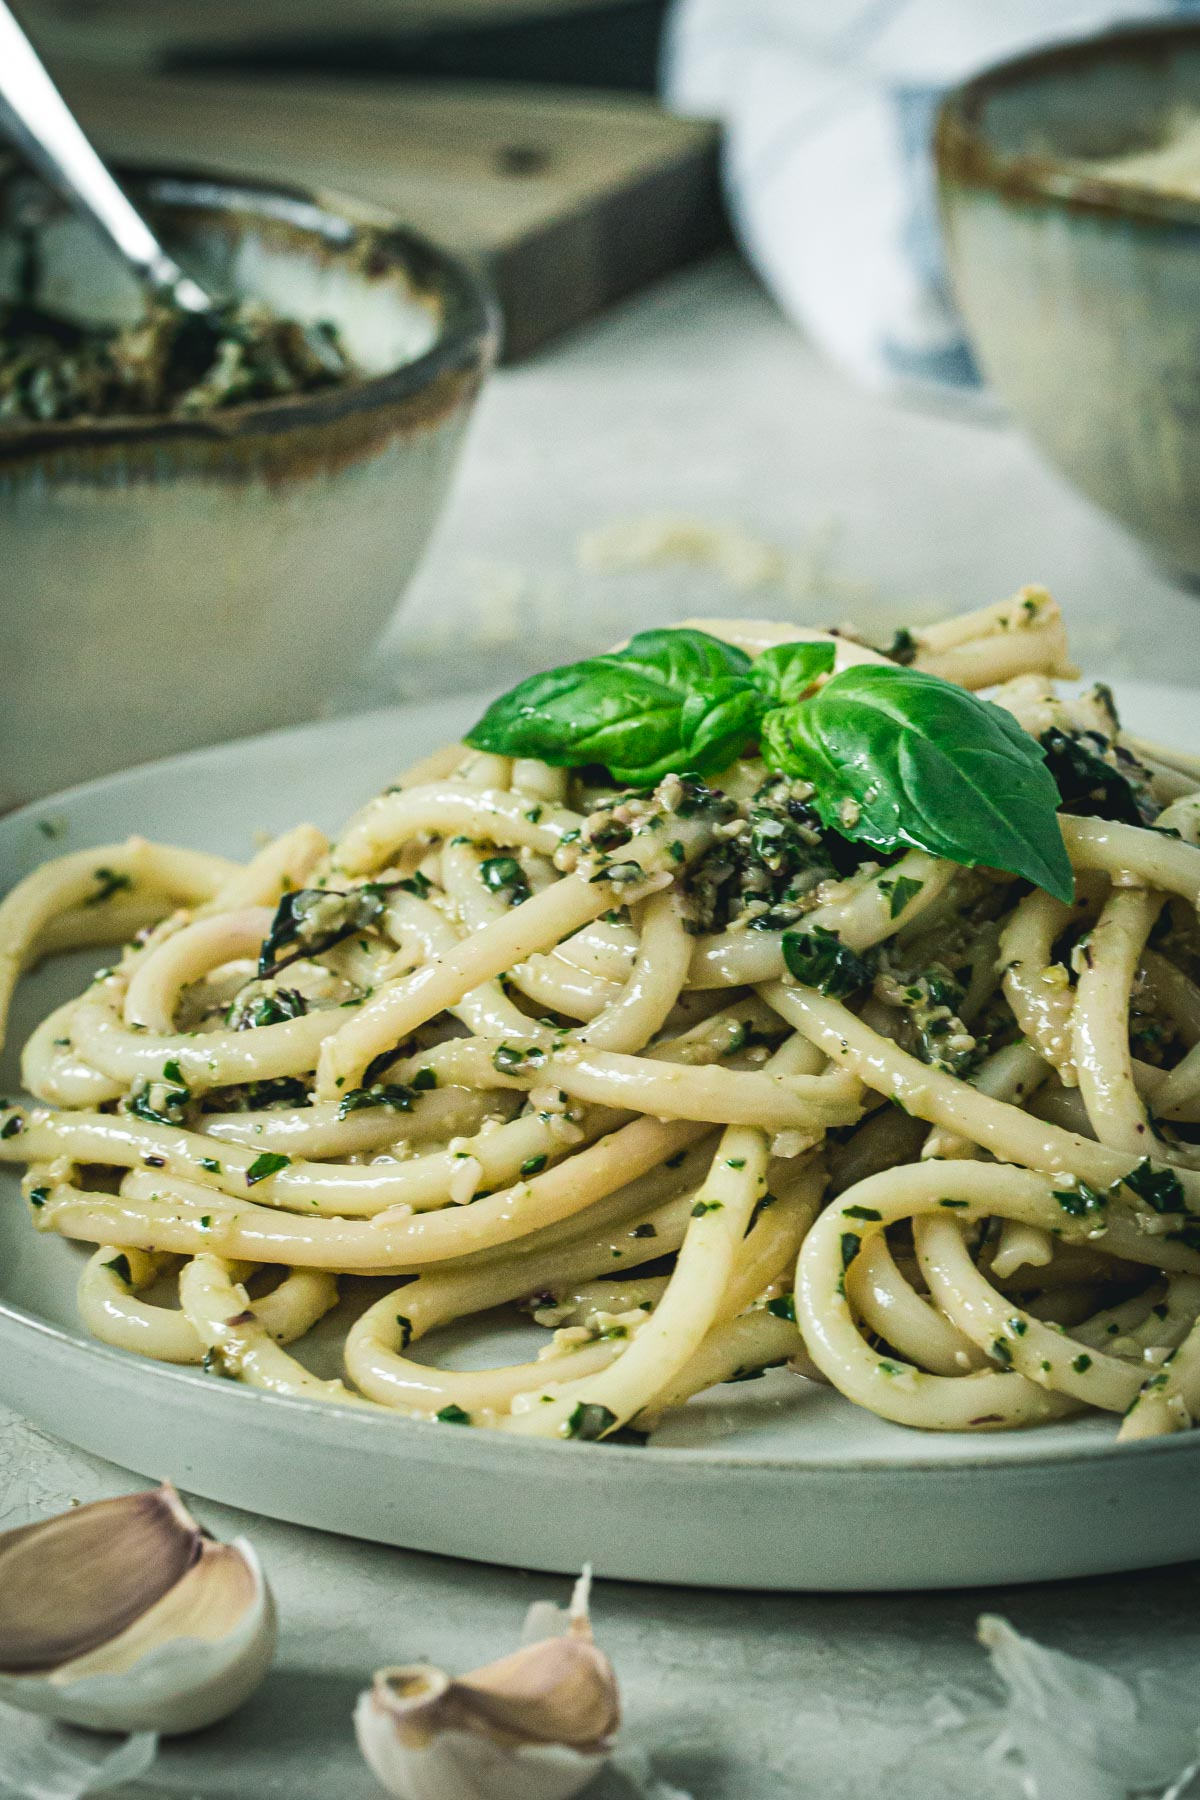 Beet greens pesto pasta on a white plate.